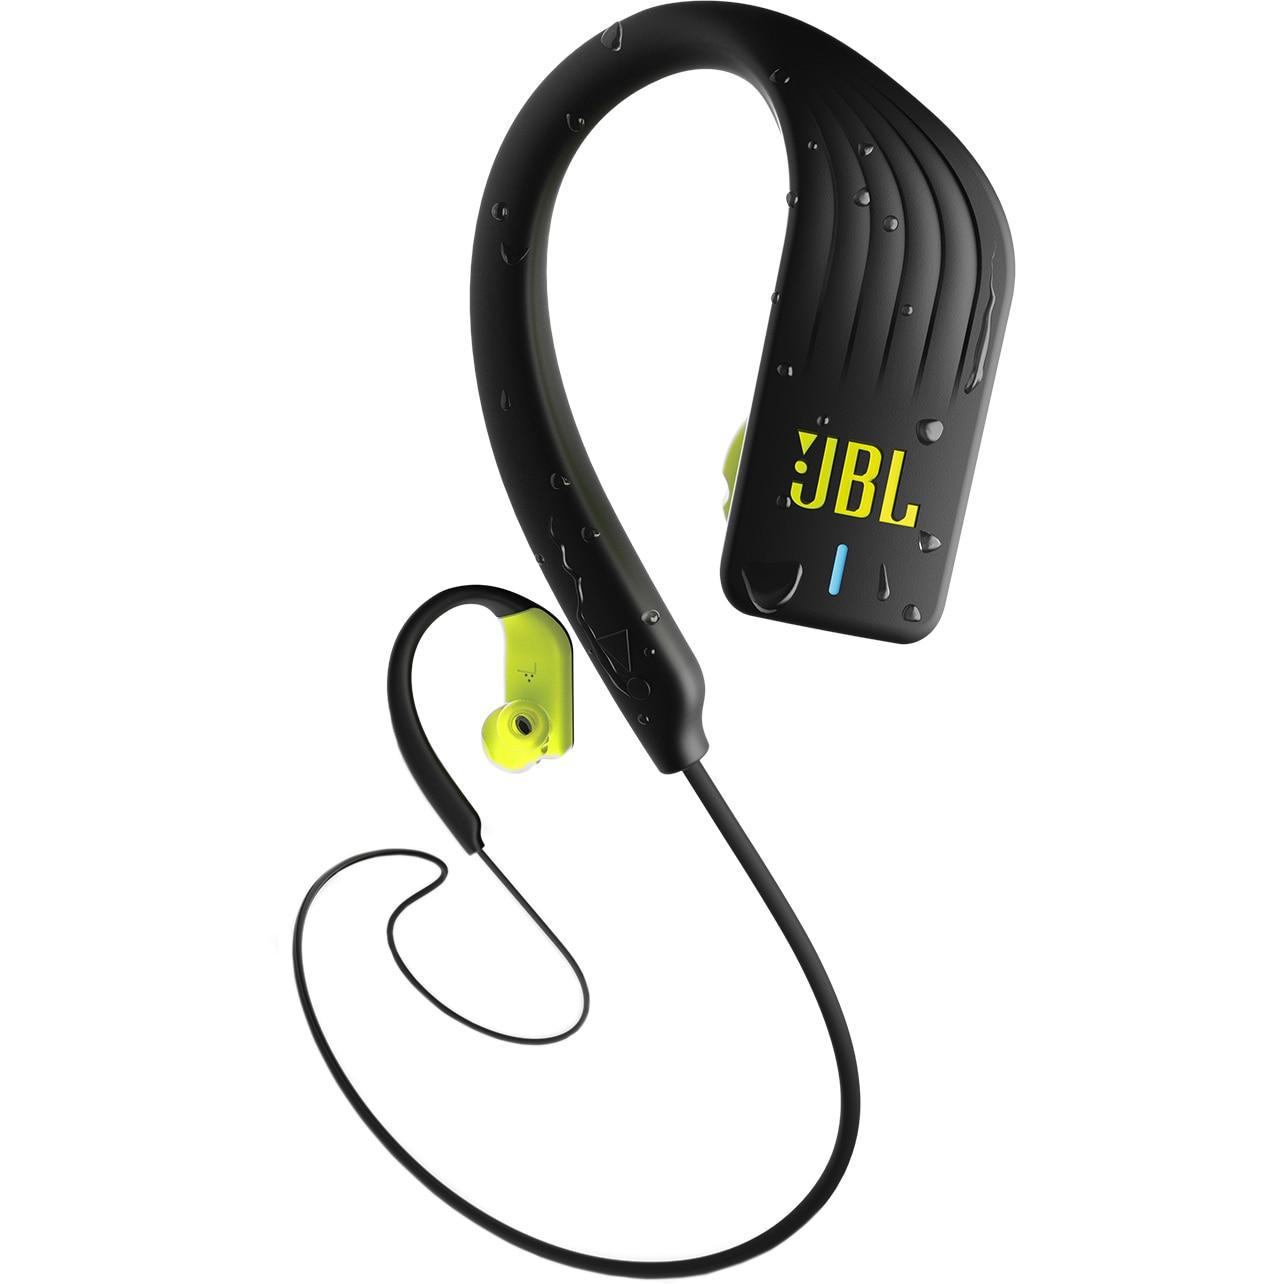 Fotografie Casti sport In-Ear JBL Endurance SPRINT, Waterproof, Bluetooth, Touch control, Twistlock, Hands-free, 8h Playback, verde